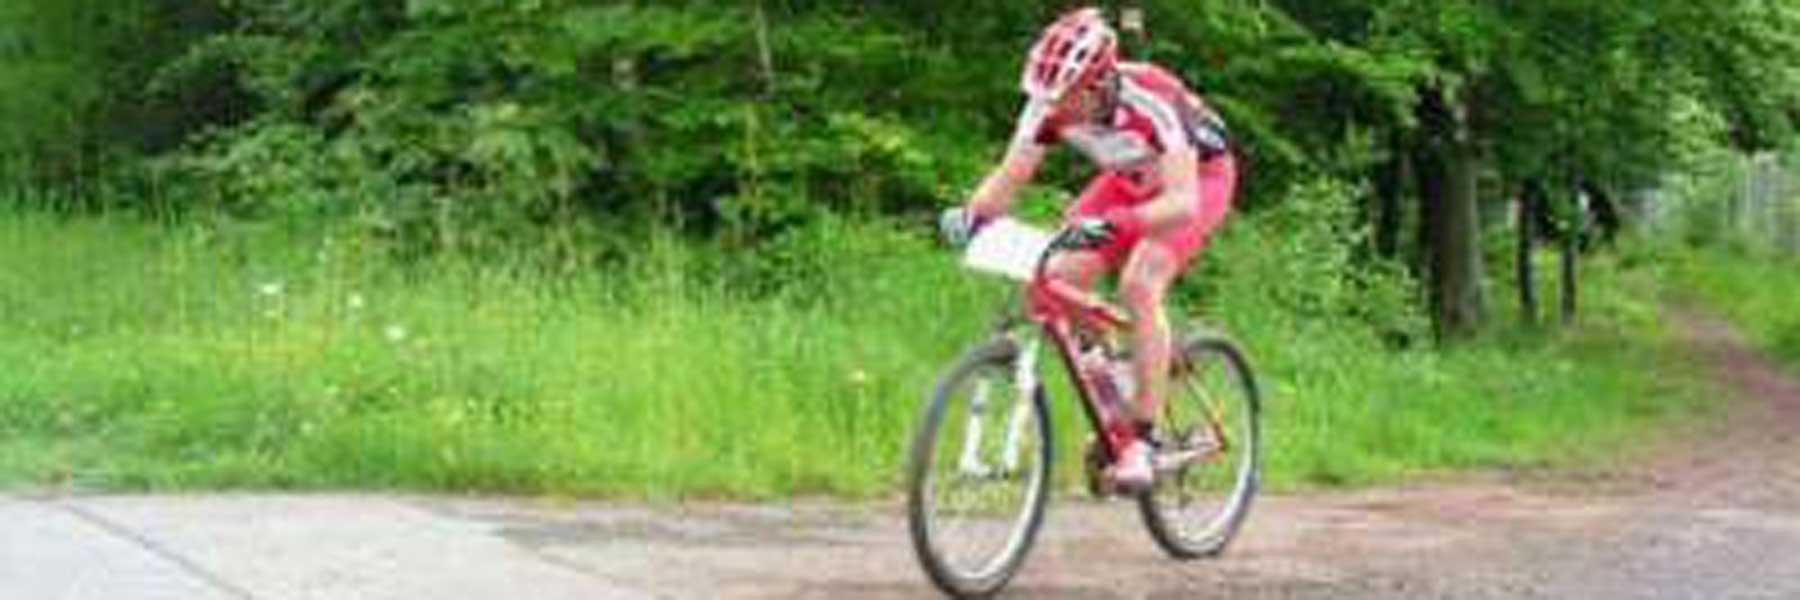 Bike-Marathon in Orscholz 2005 Image